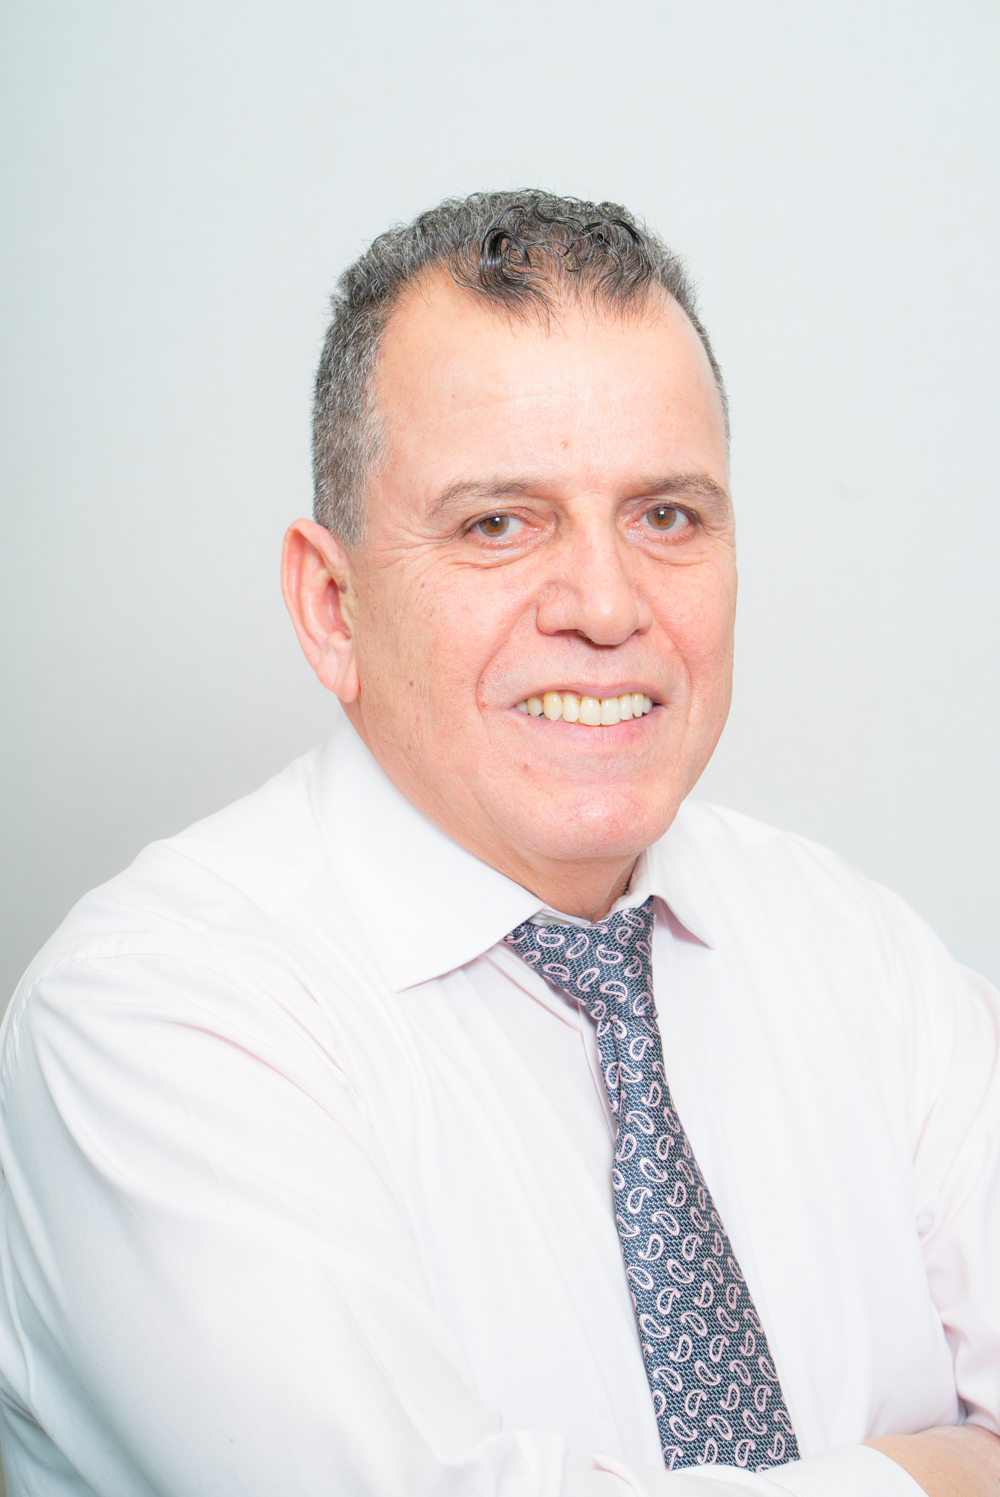 Gheith Ben Khaial, DDS, MSc